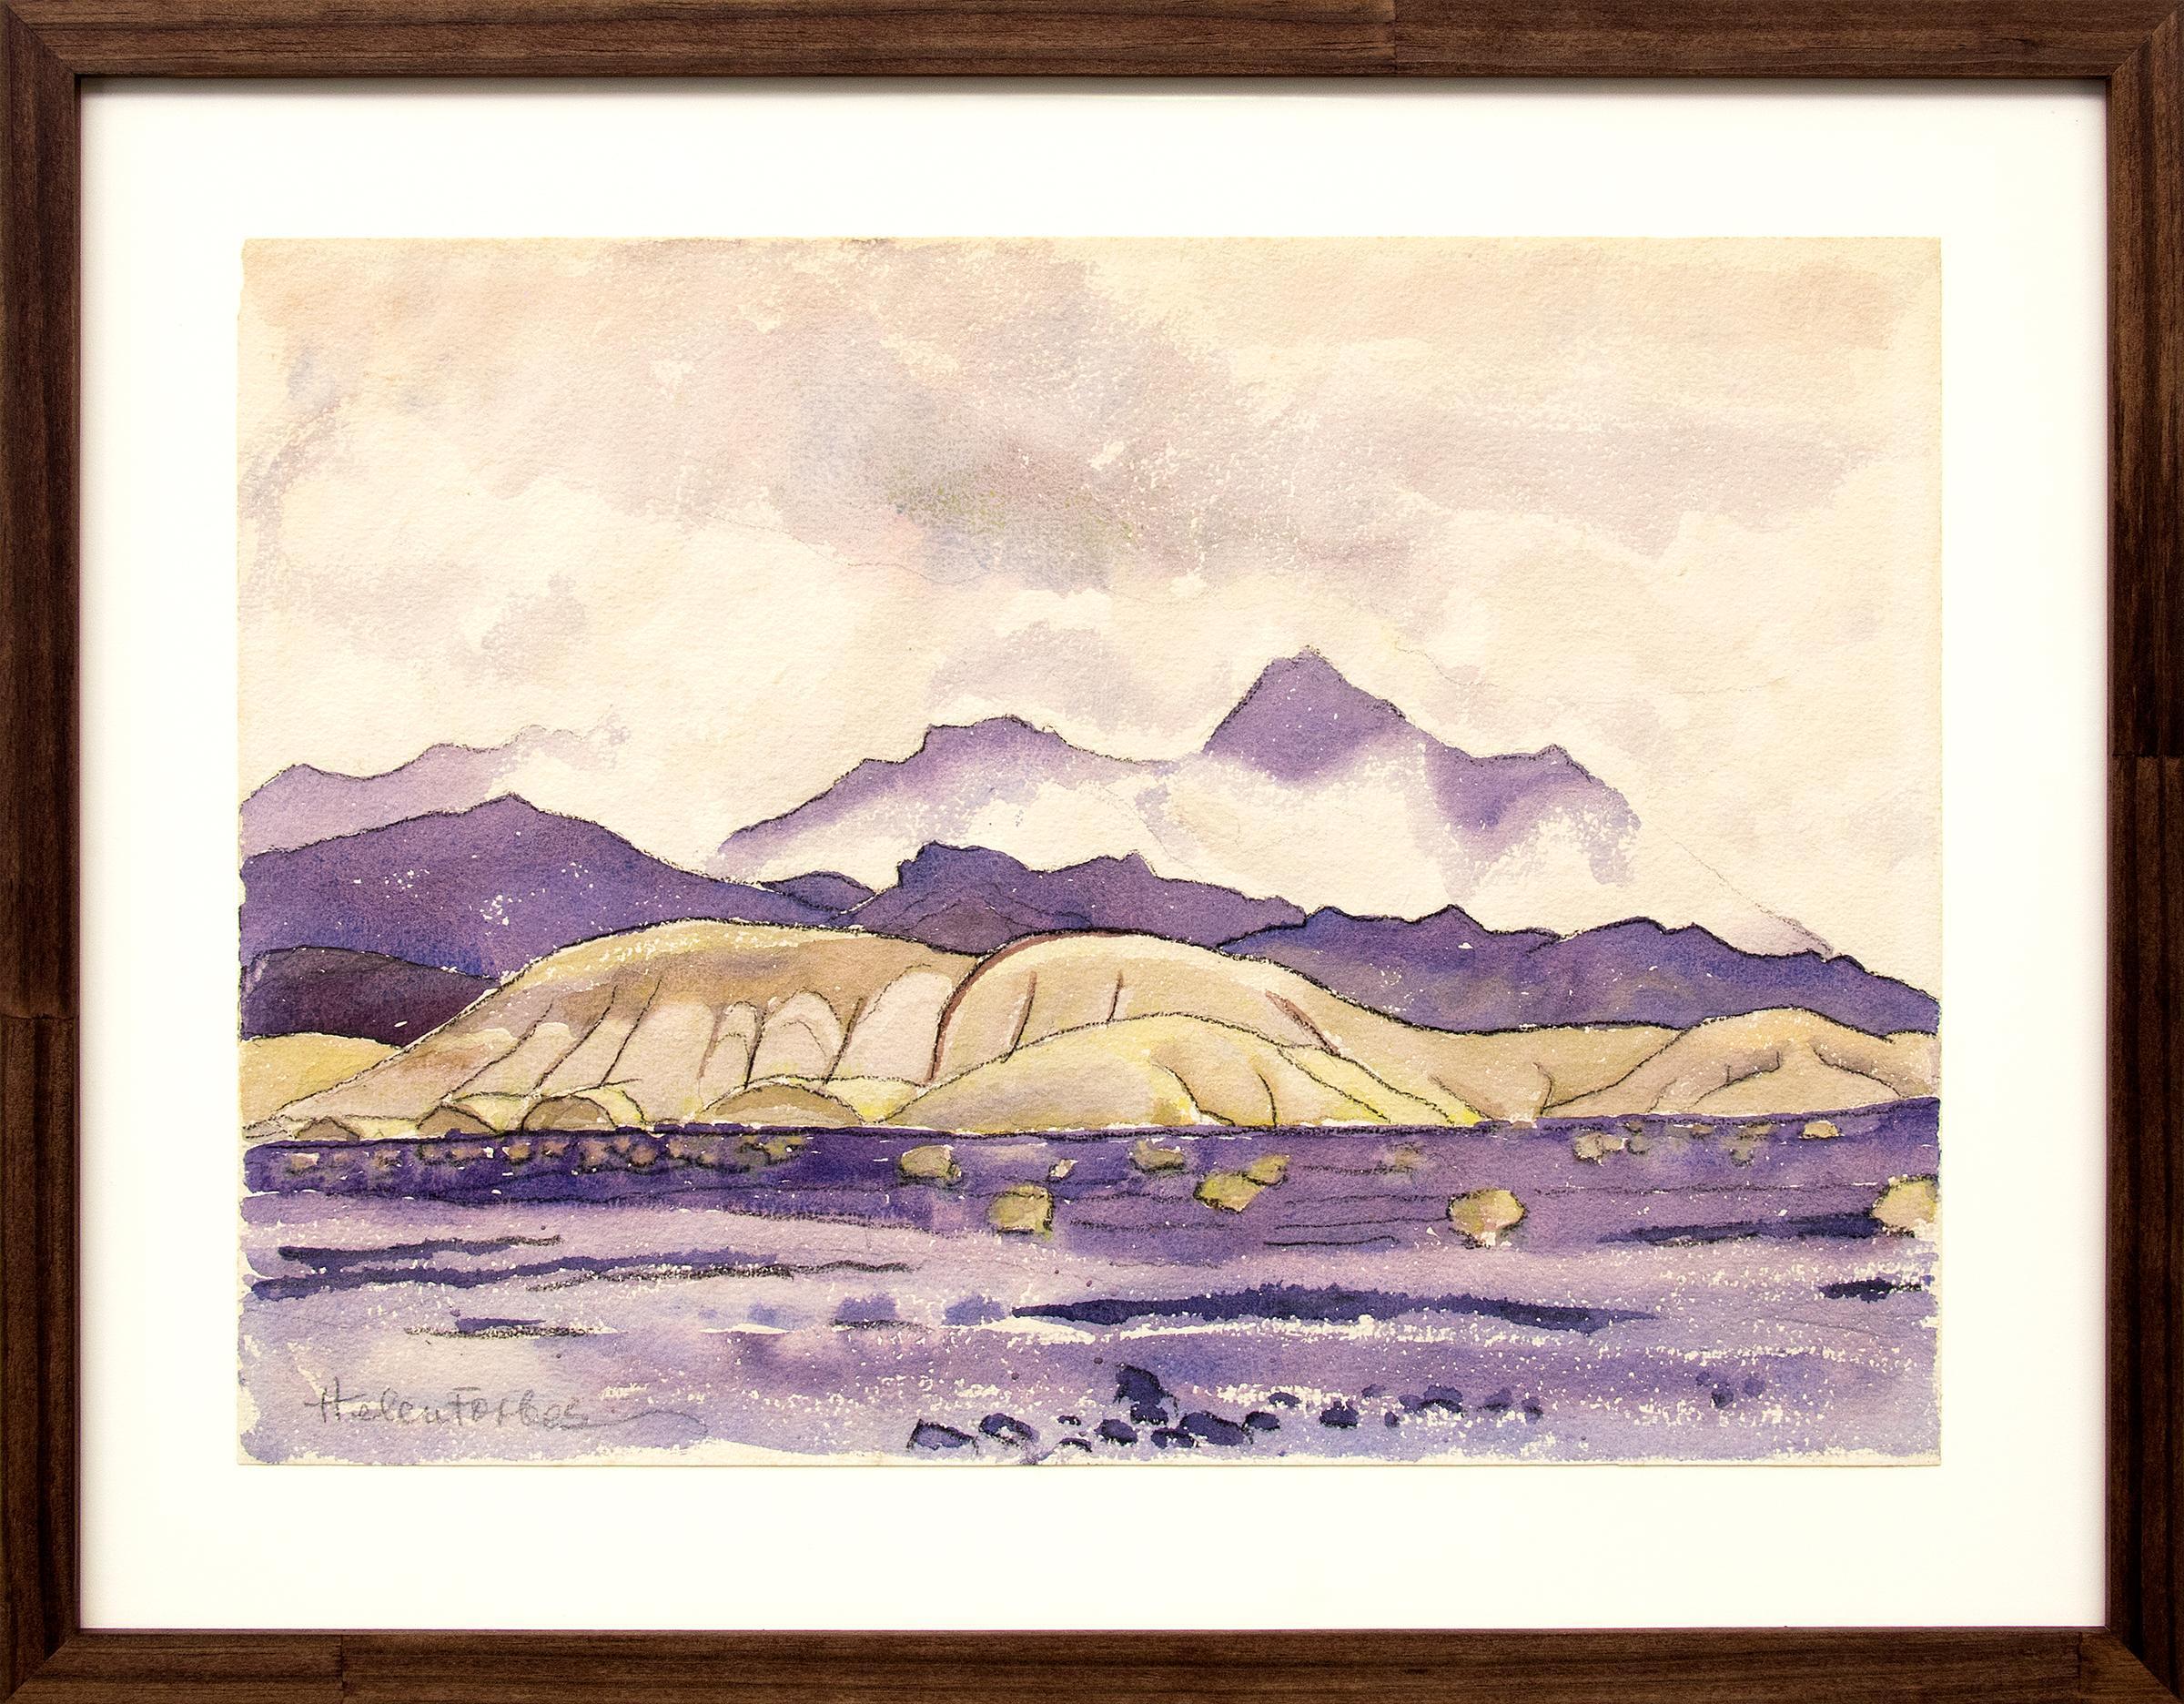 Clouds in the Desert, California Desert Mountain Landscape, Purple, Green, White